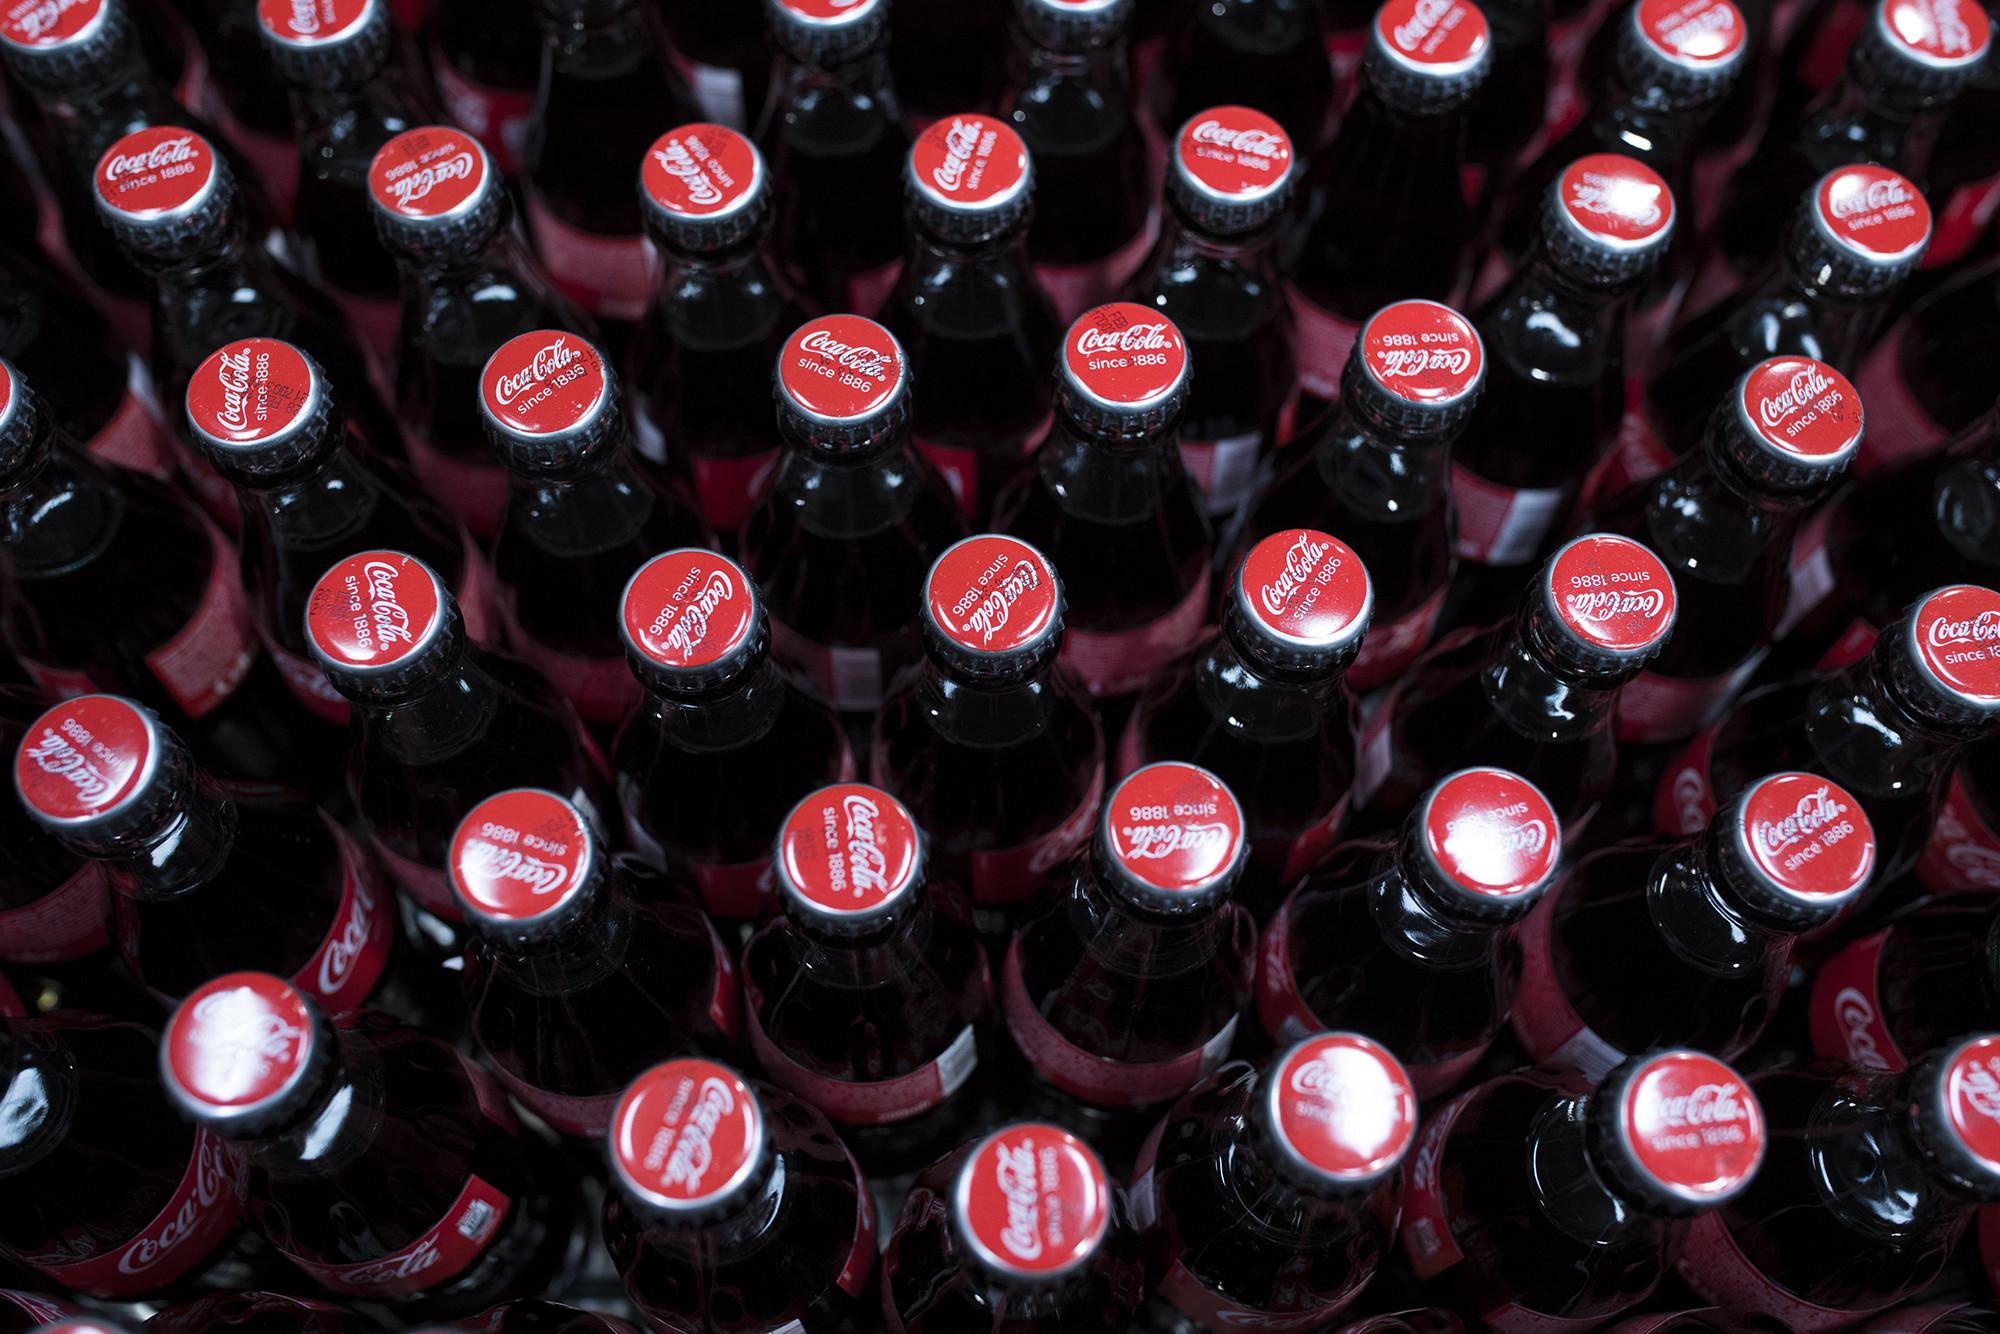 Coca Cola Fans Fret As Company Revamps Beloved Loyalty Program